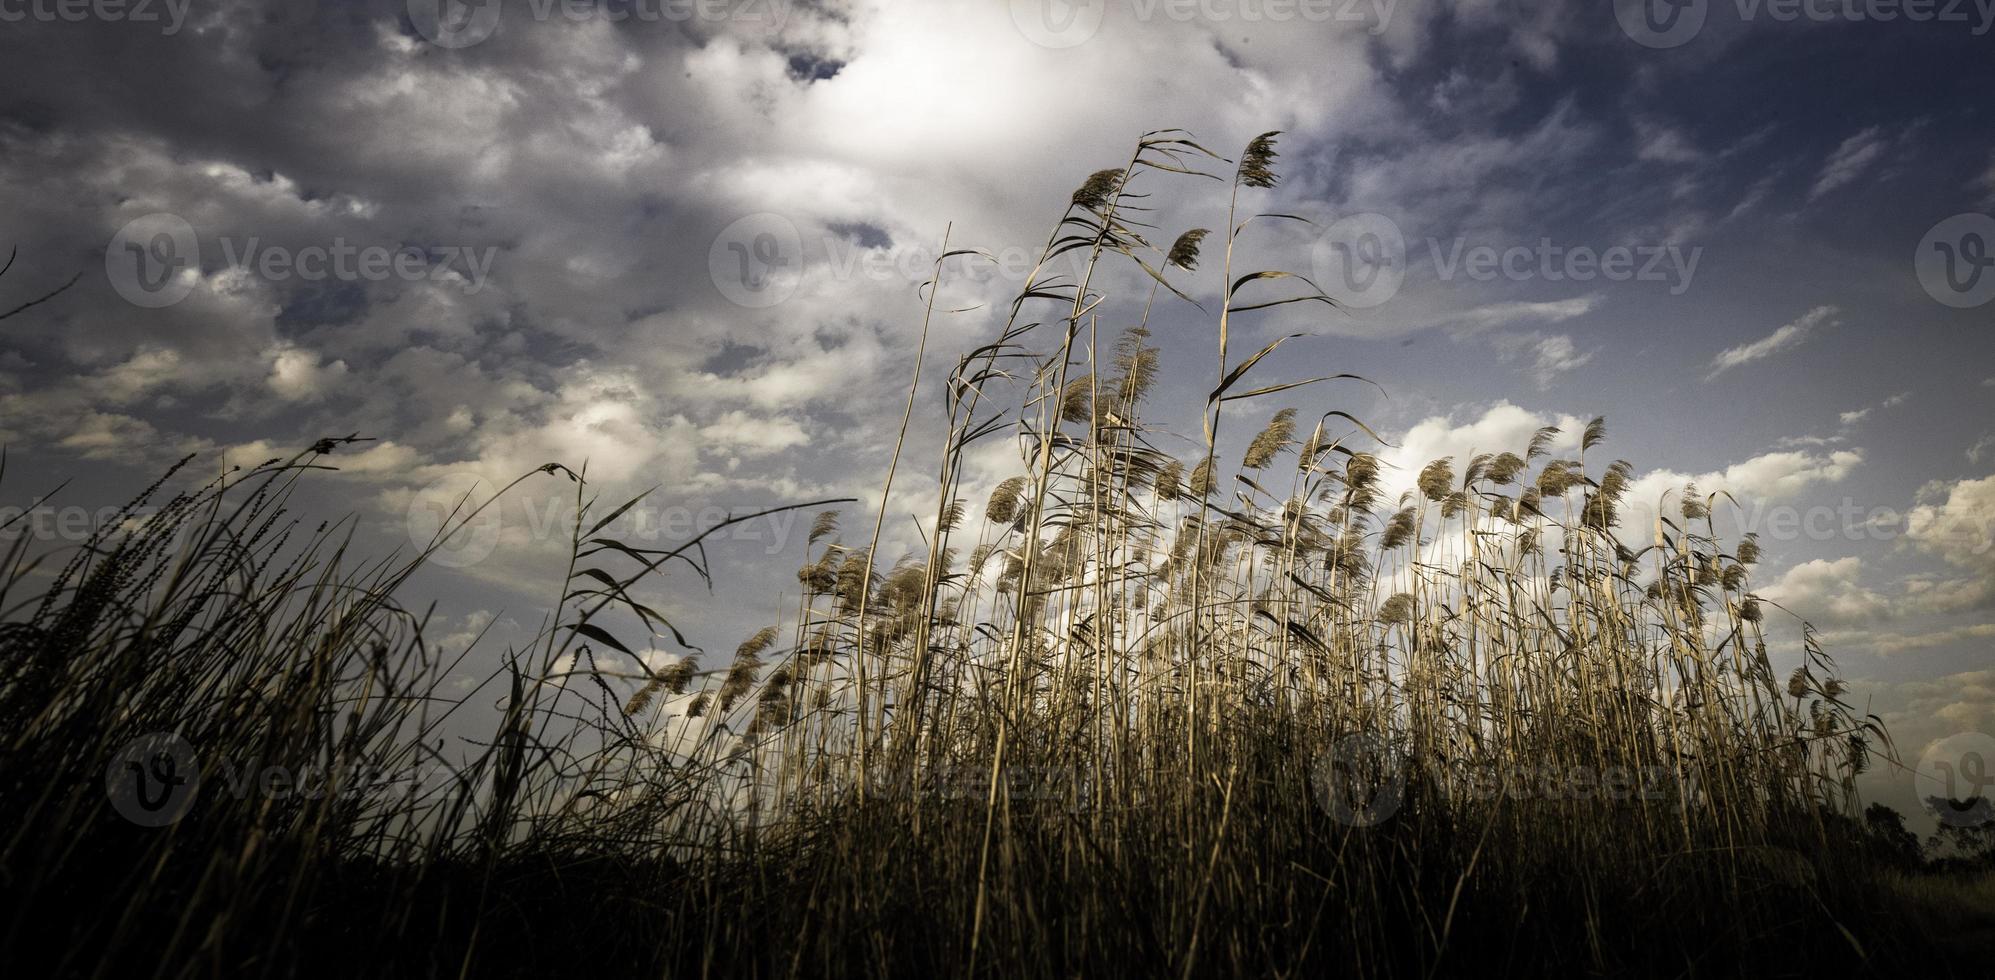 berwick lake melbourne photo